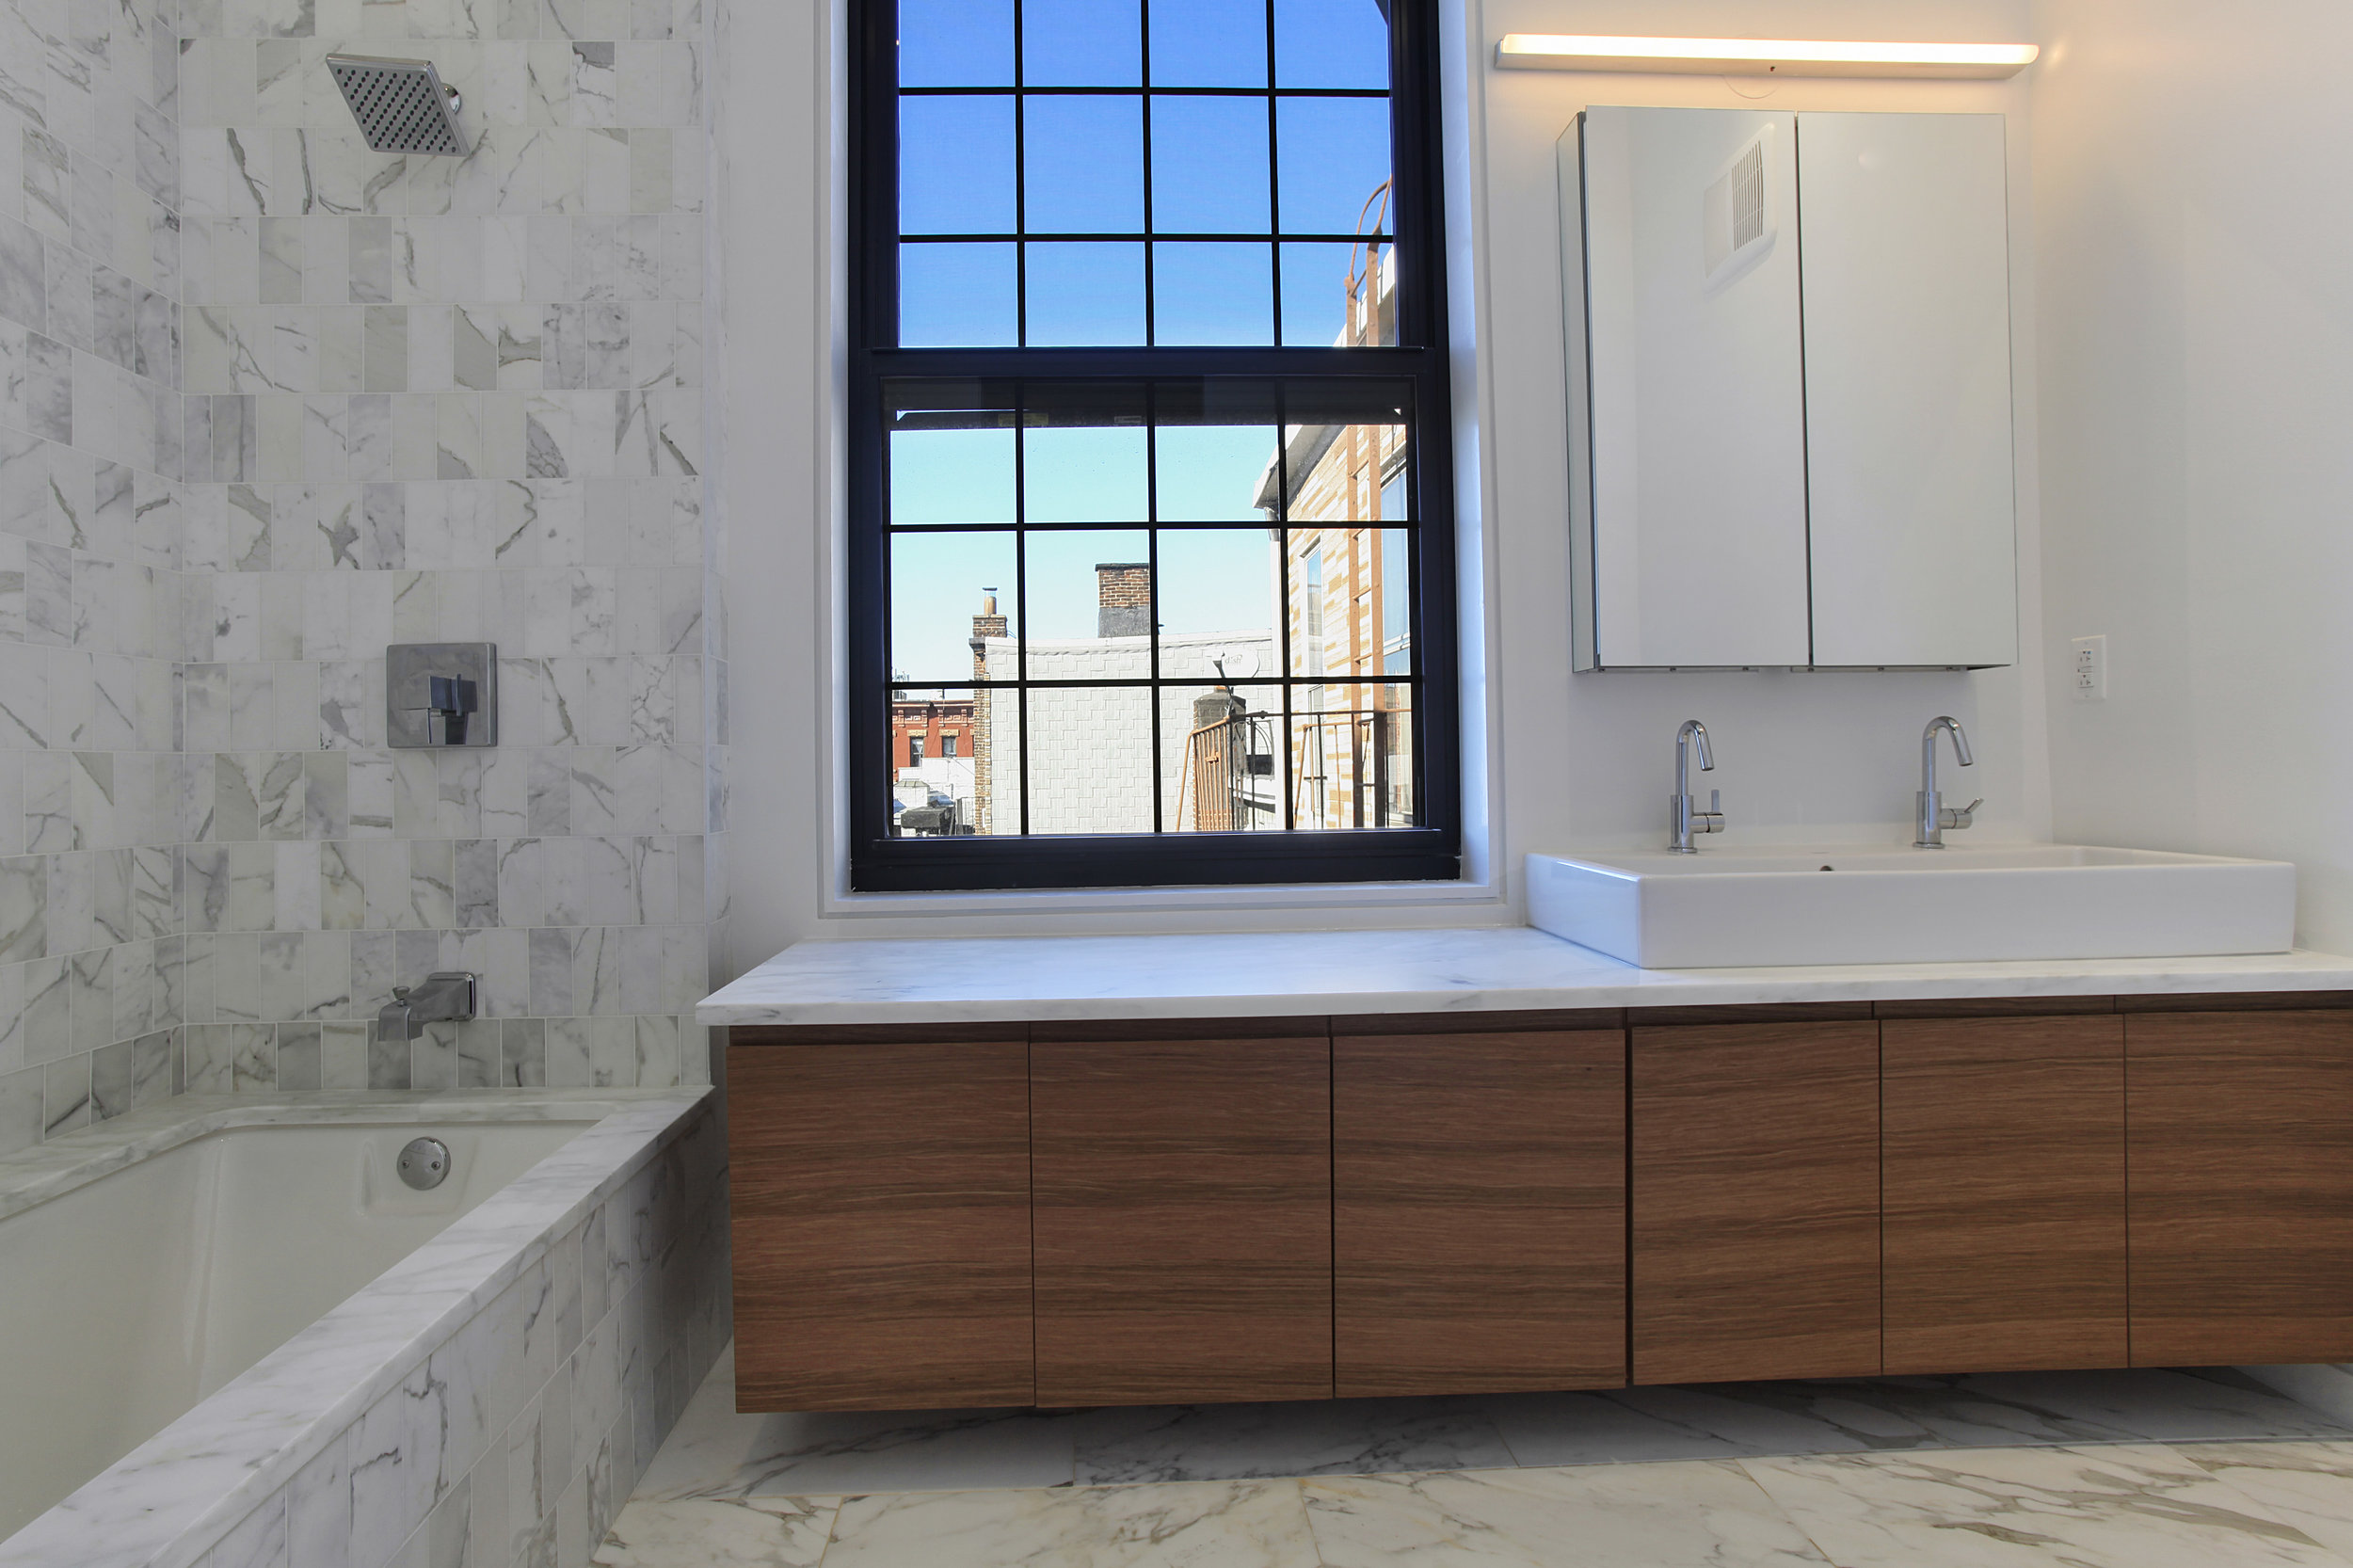 541Leonard-4-master bath.jpg